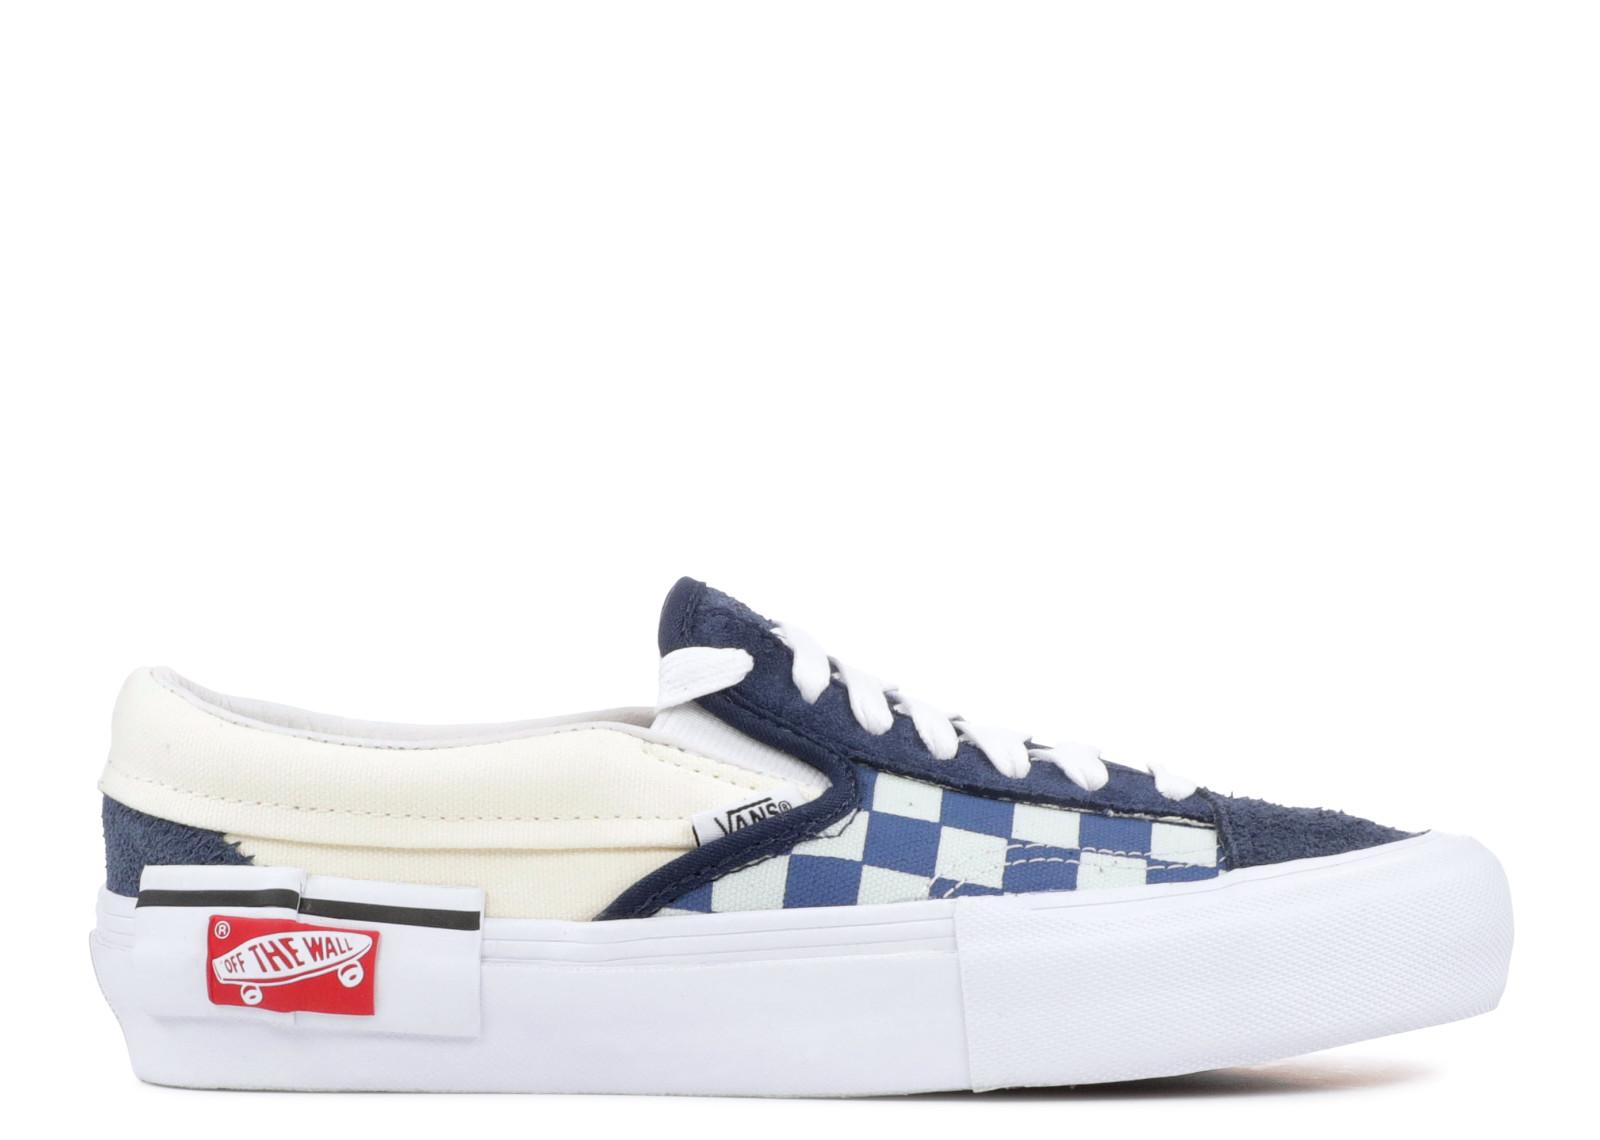 78c73e47df Kick Avenue - Authentic Sneakers